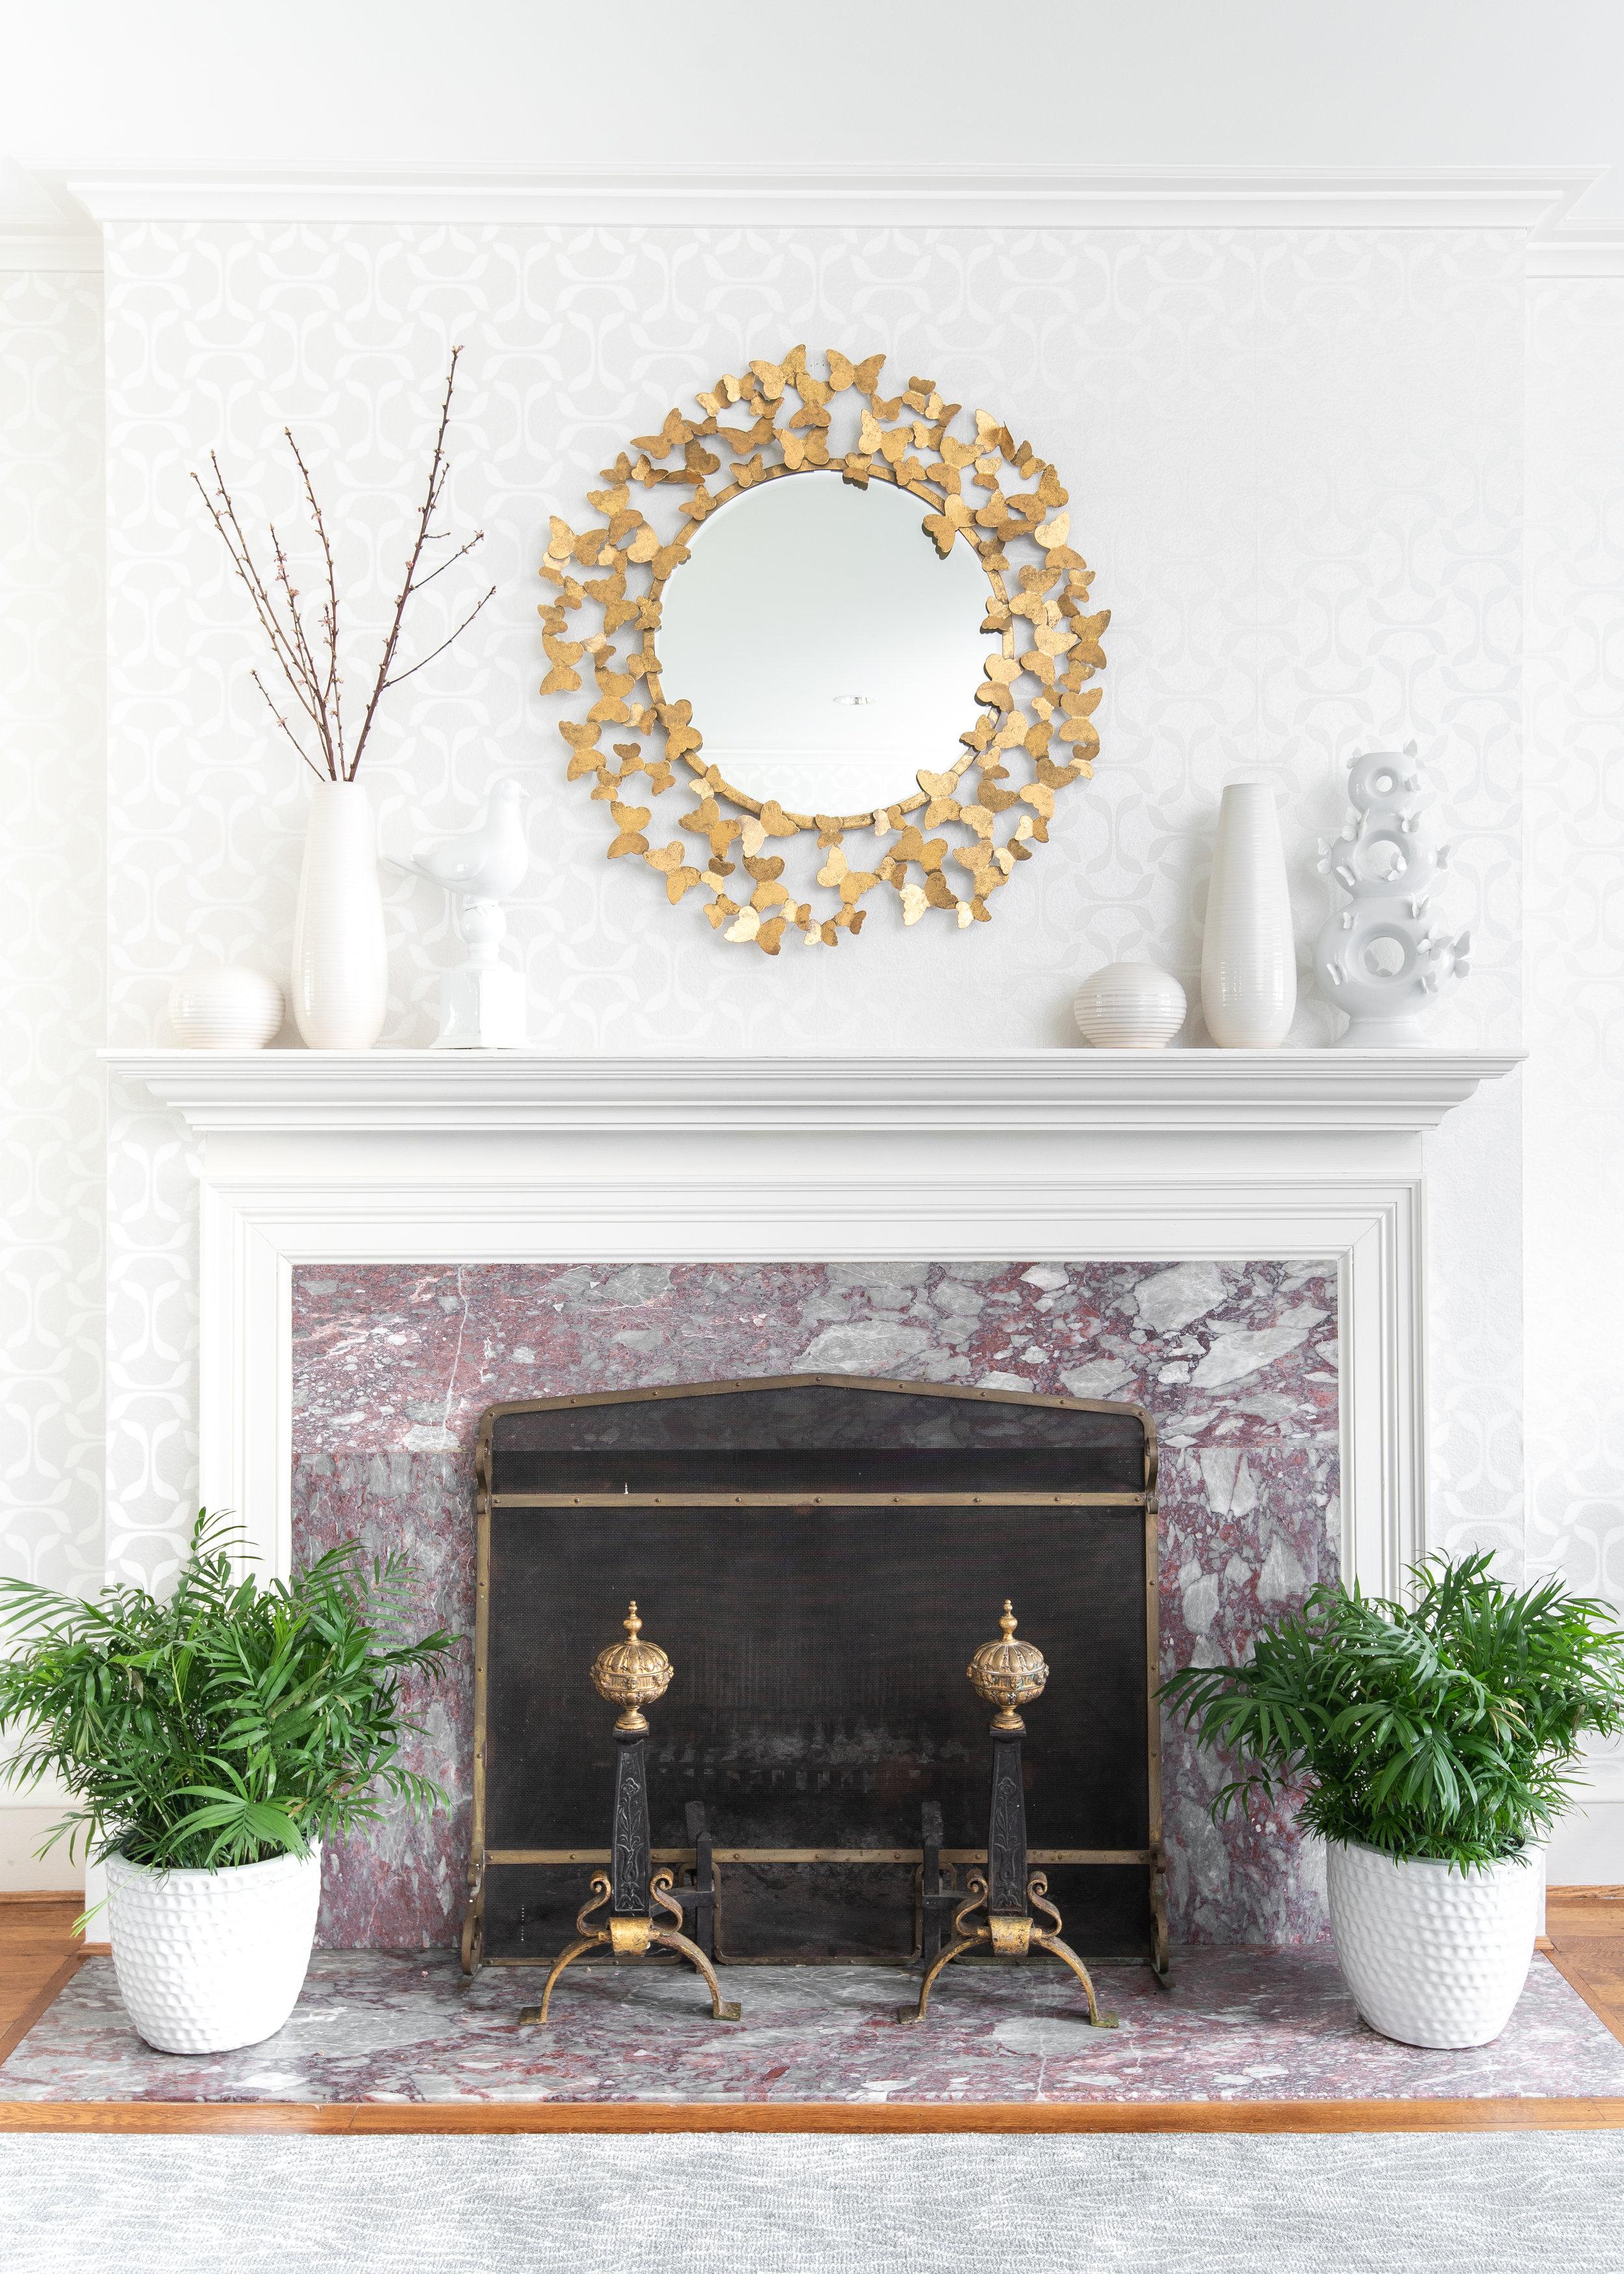 elegant-fireplace-mantle-purple-stone-gold-mirror-interior-design-dmv-decorator-dc-mariella-cruzado-splendor-styling.jpg